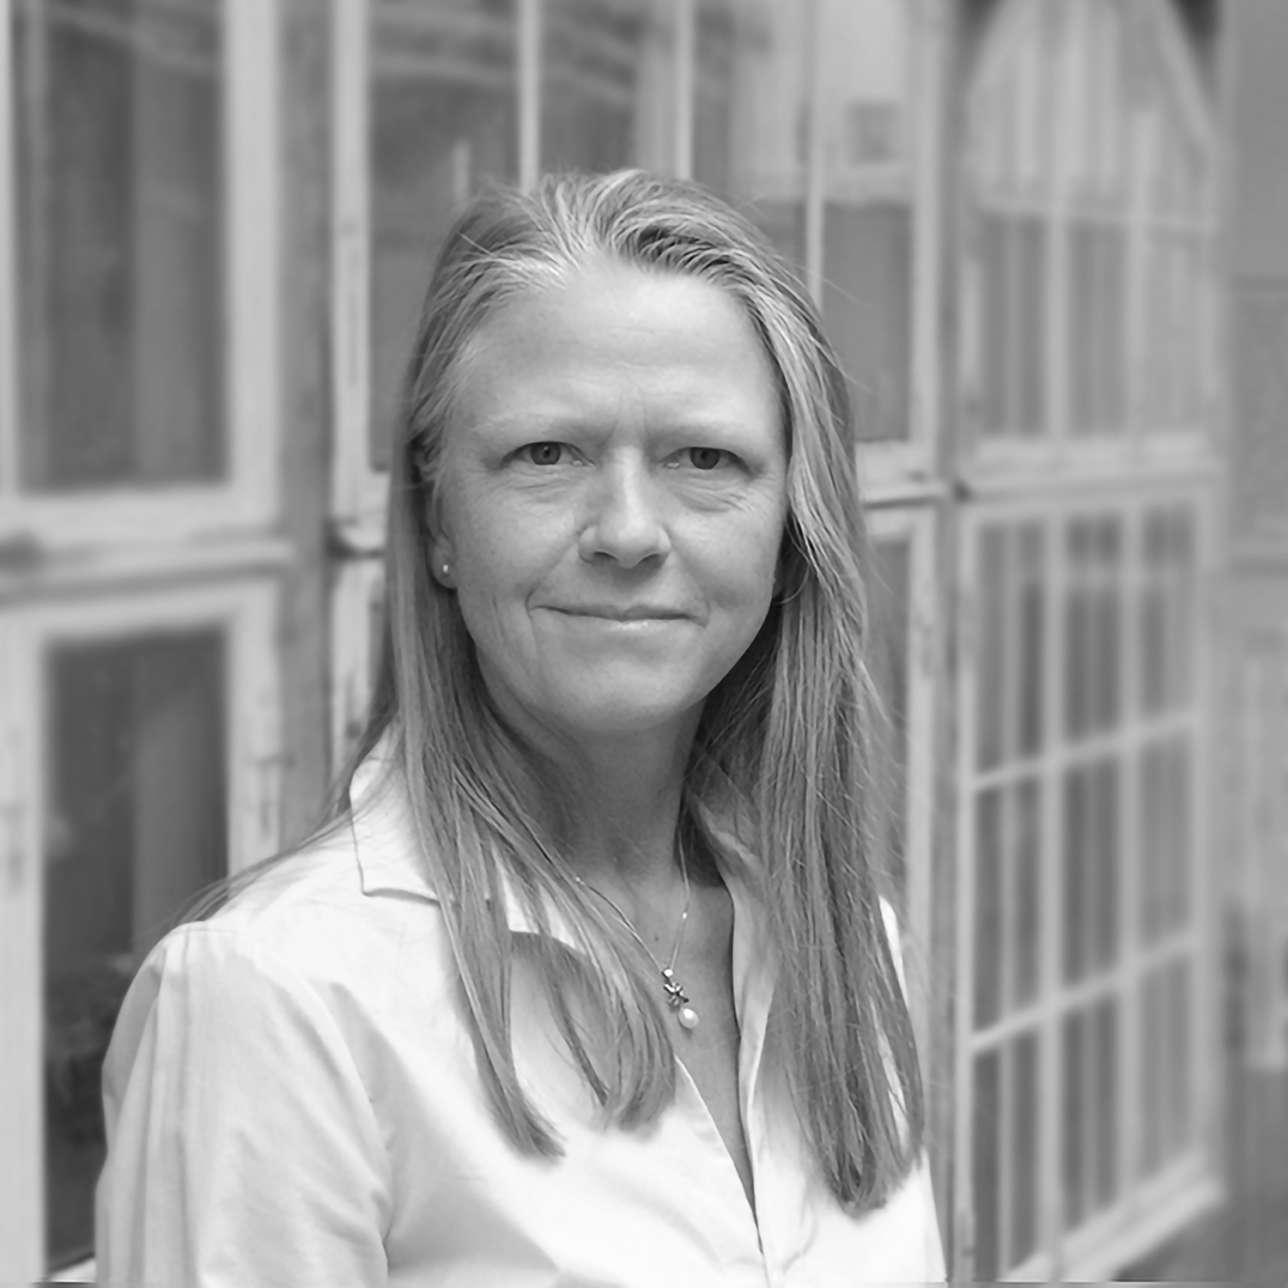 Yvonne Larsen